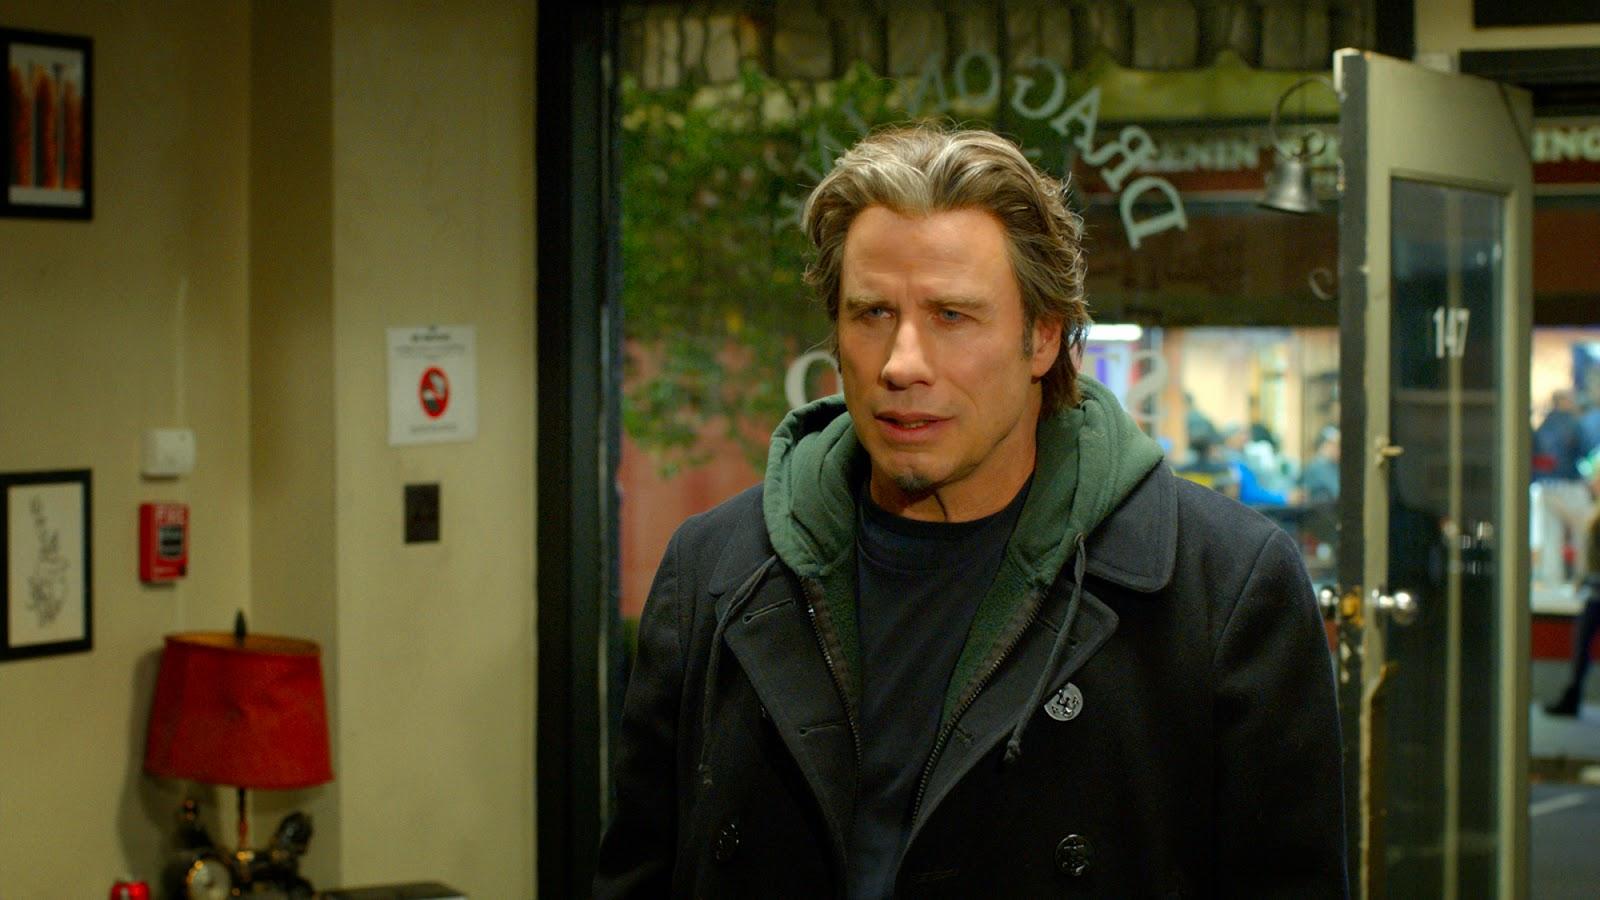 john travoltas crime thriller the forger gets a new